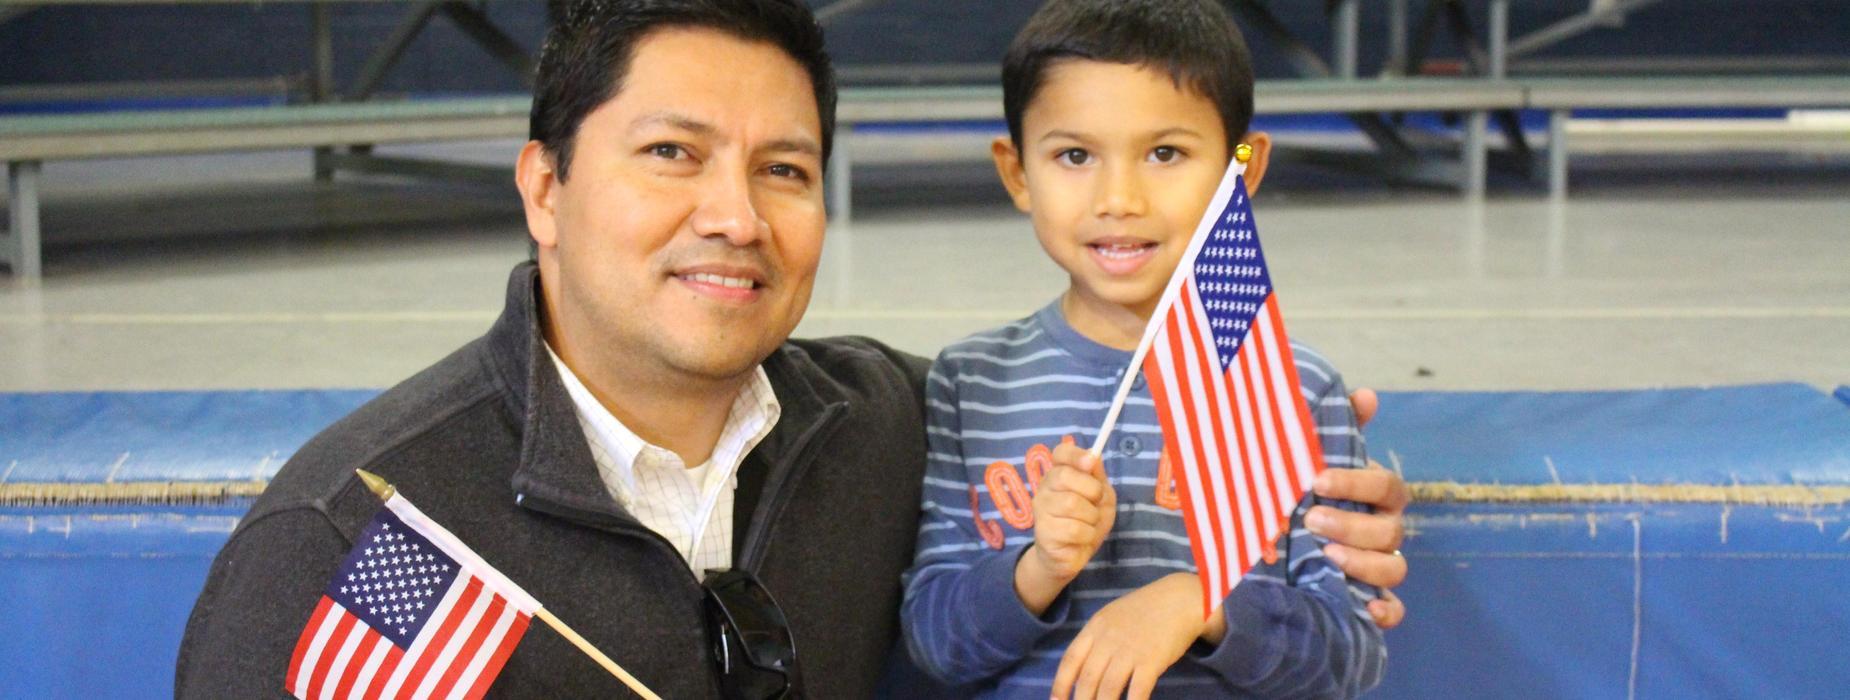 veterans day at cp